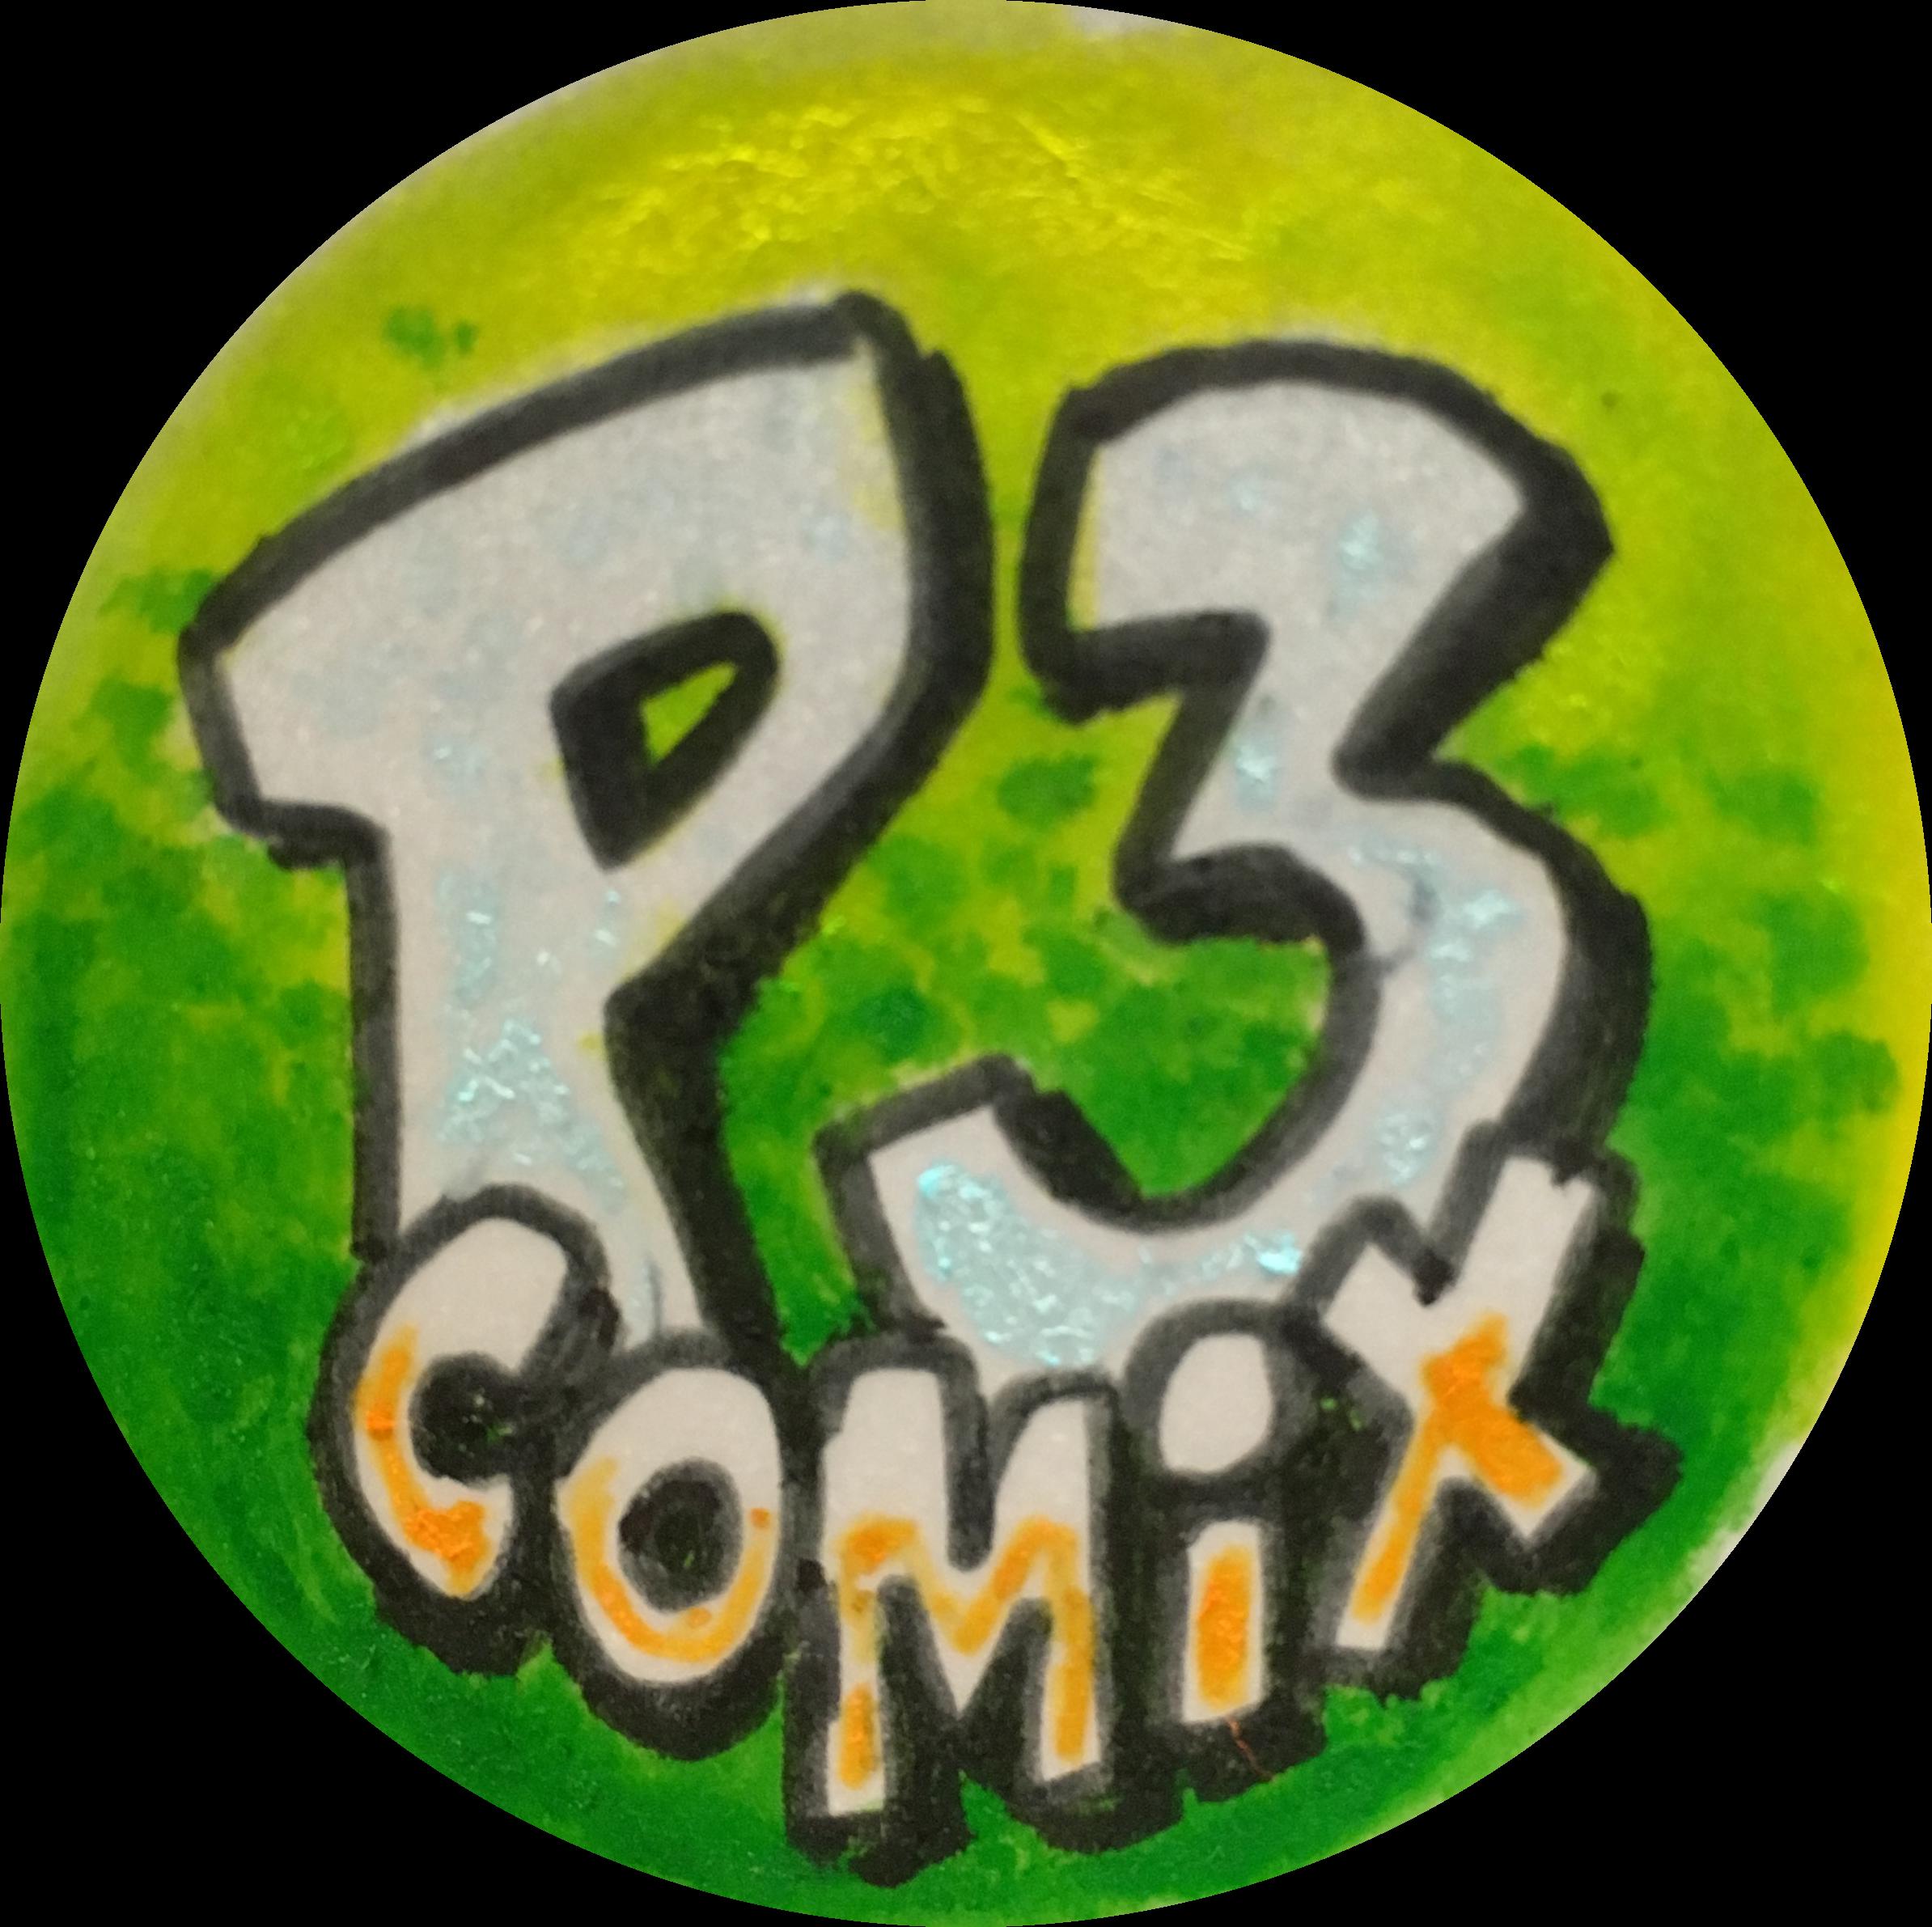 P3 Comix